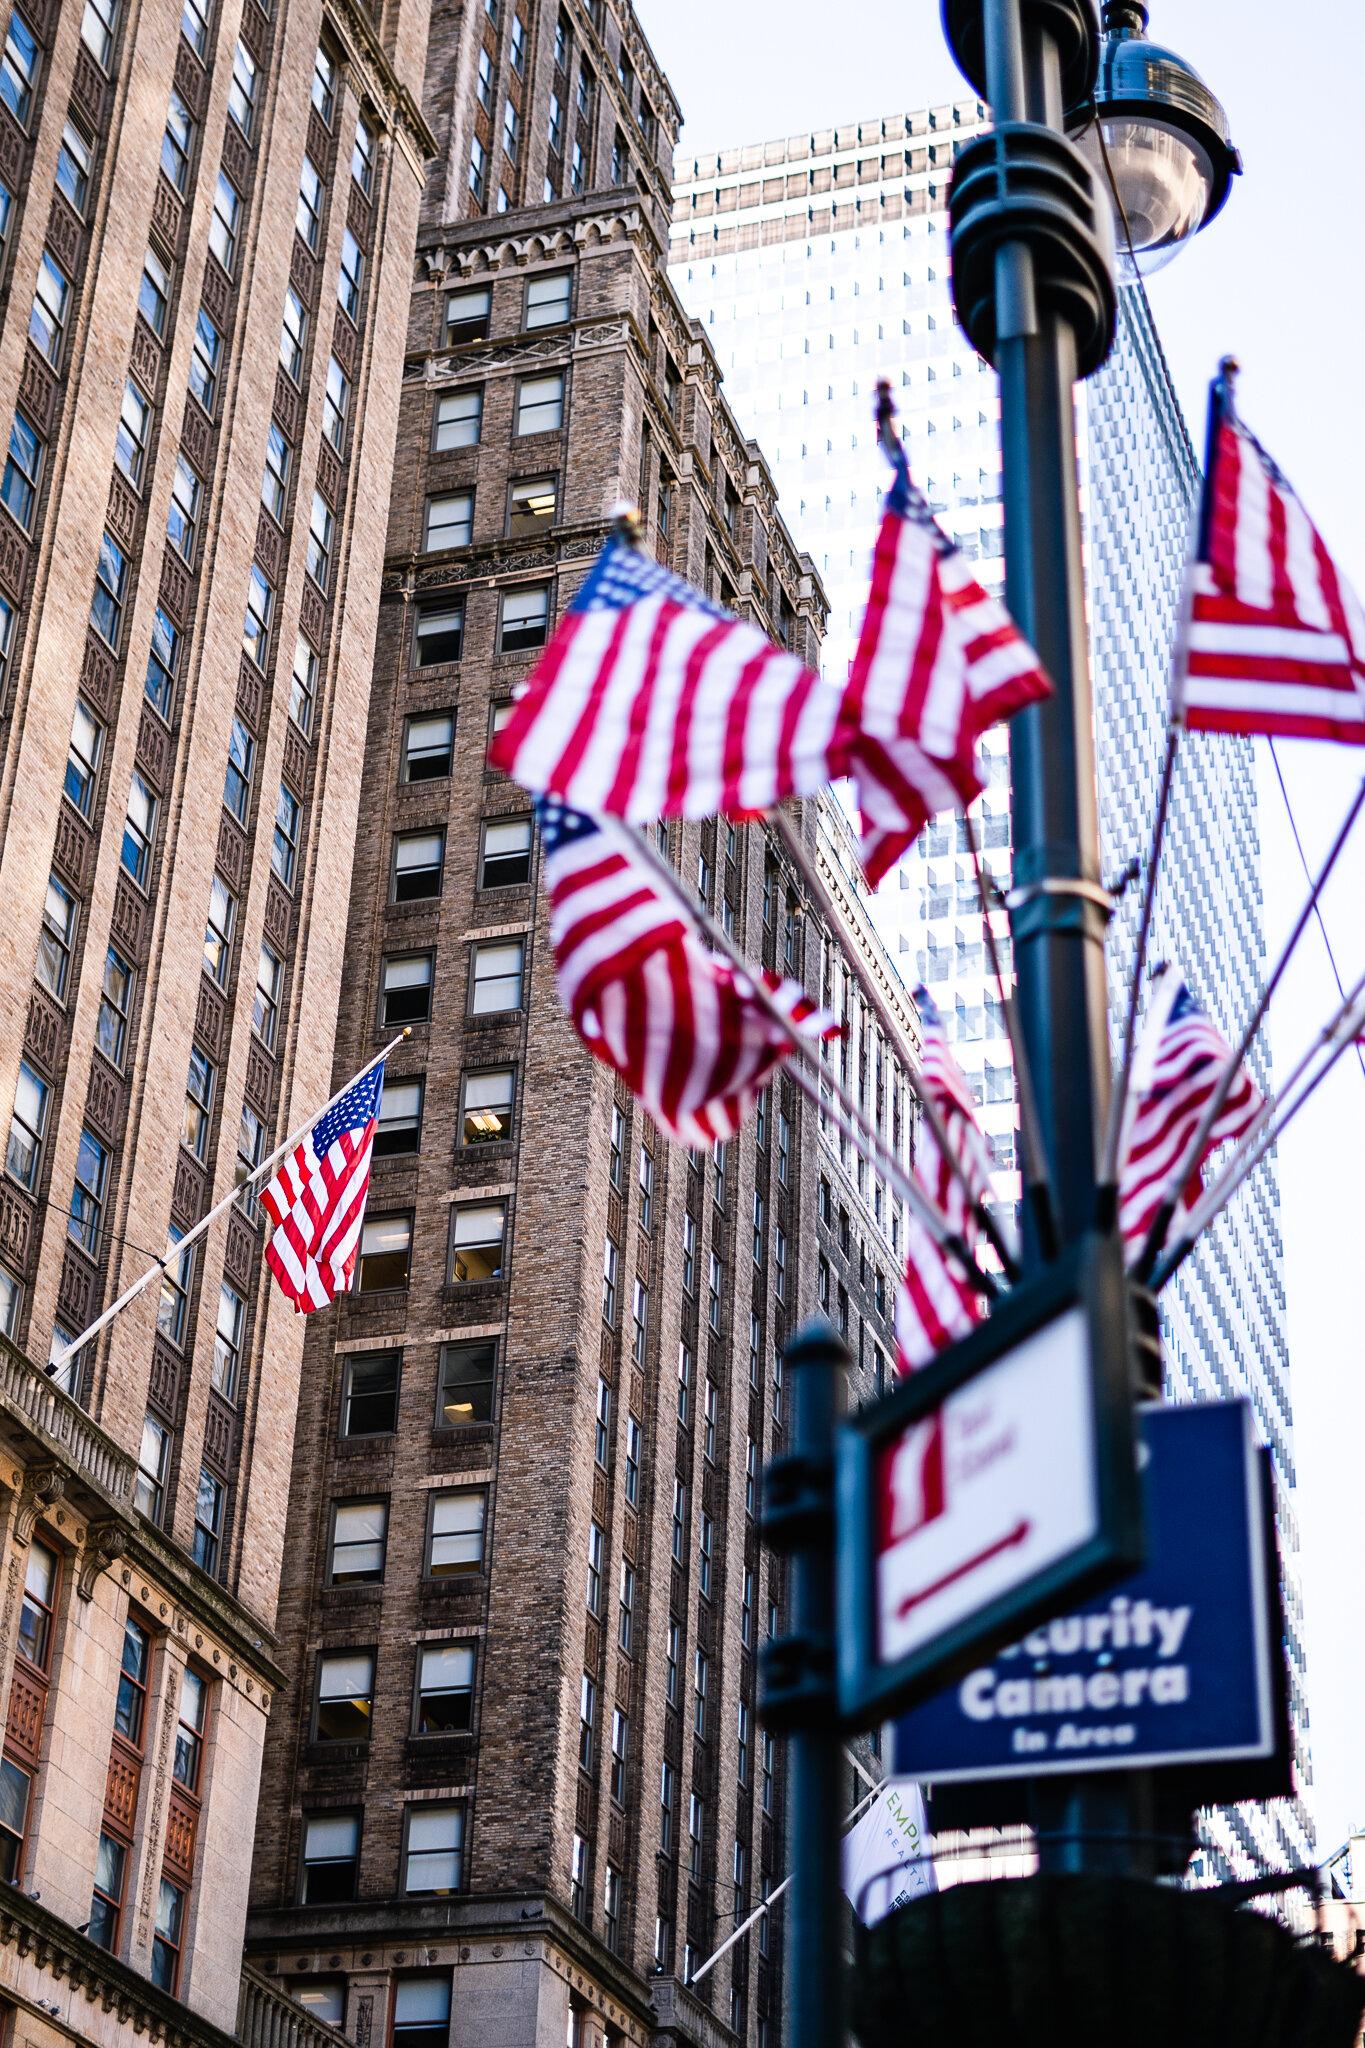 NYC-0221-VictureProd.jpg